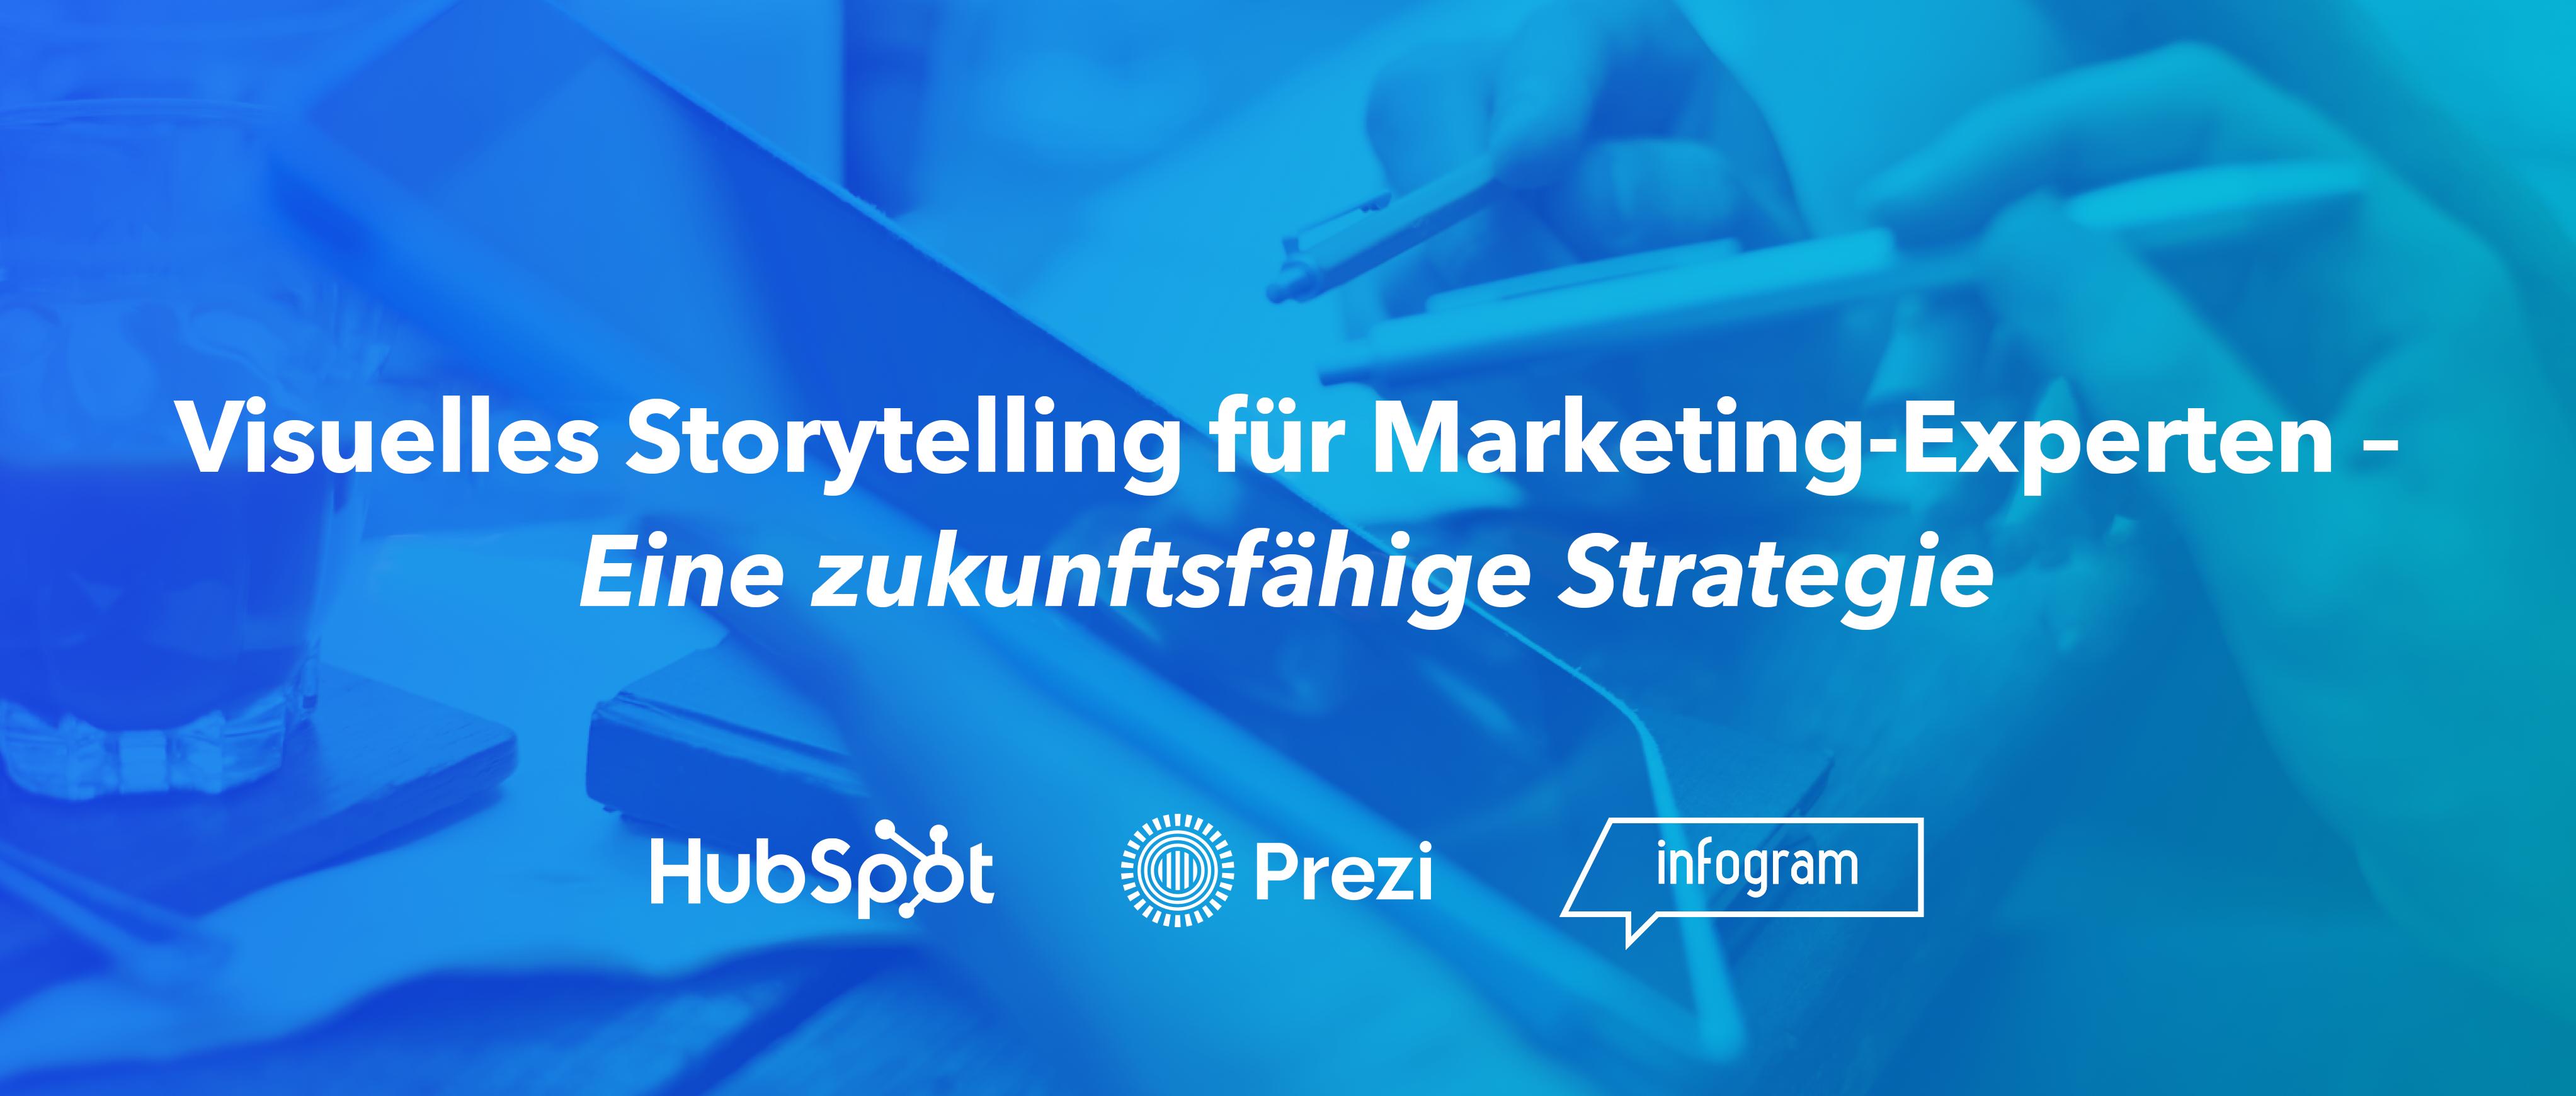 HubSpot-Prezi-Visuelles-Storytelling-Header